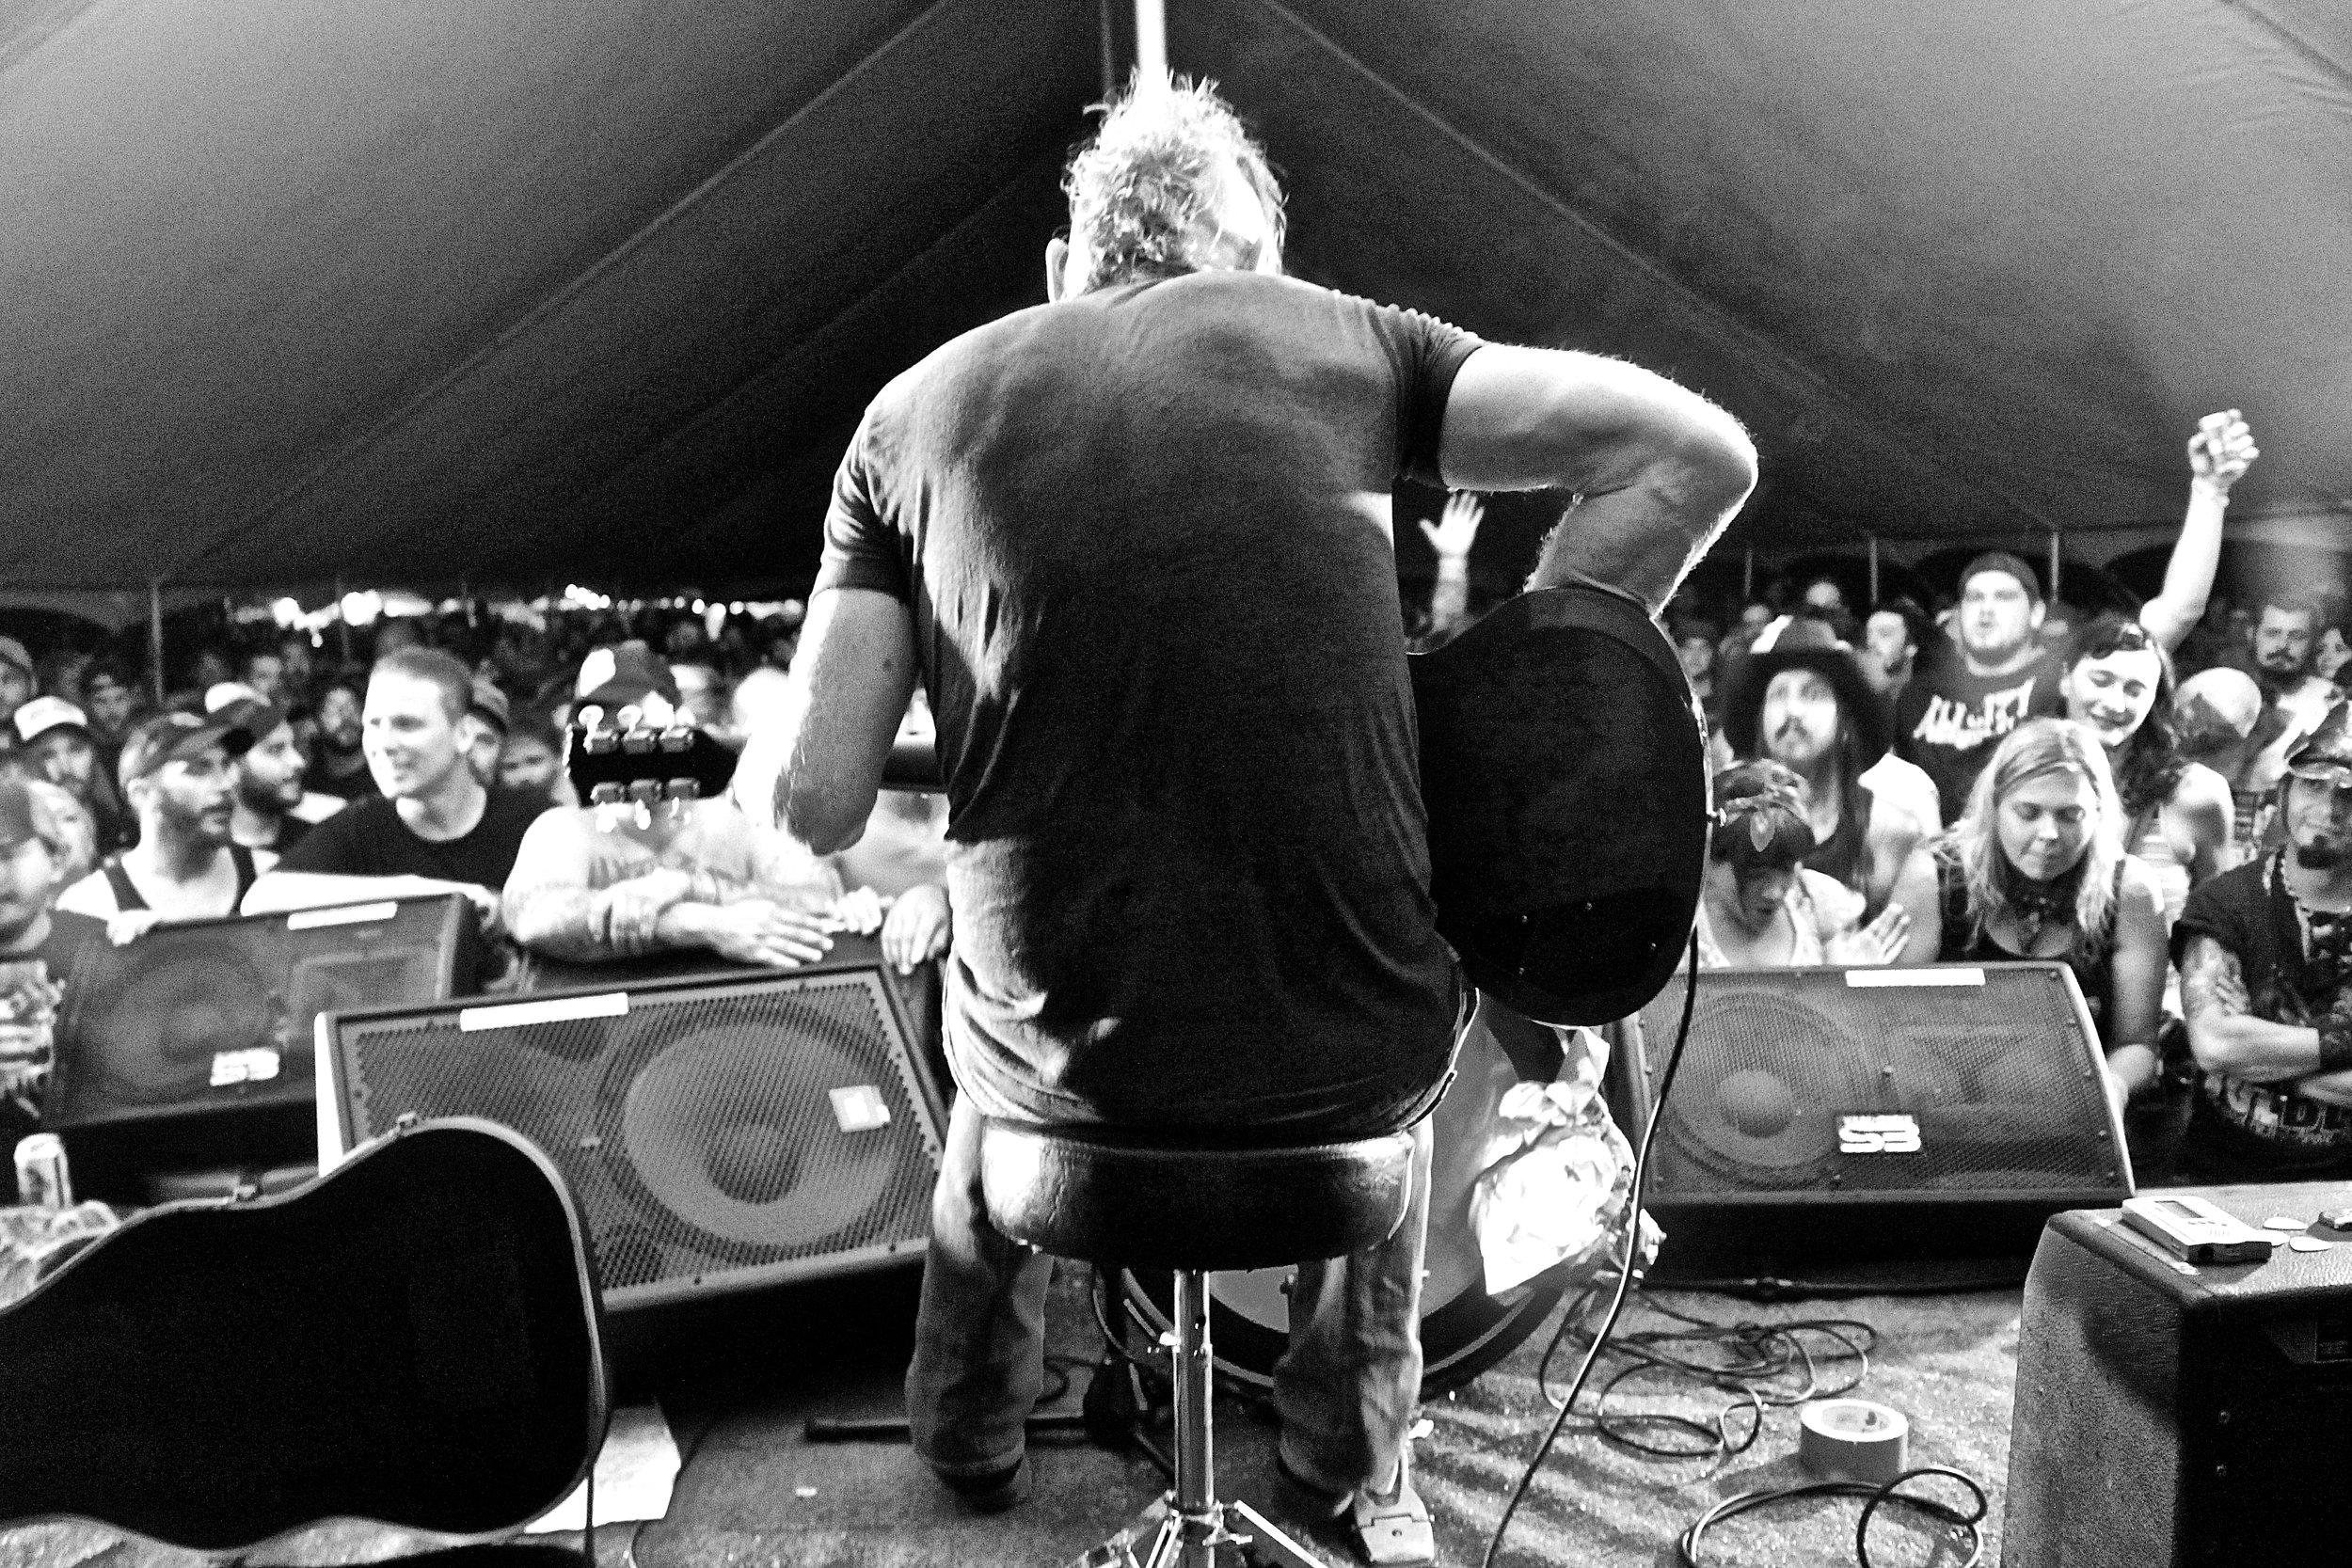 Joe Buck. Muddy Roots, Cookeville, TN. 2013.